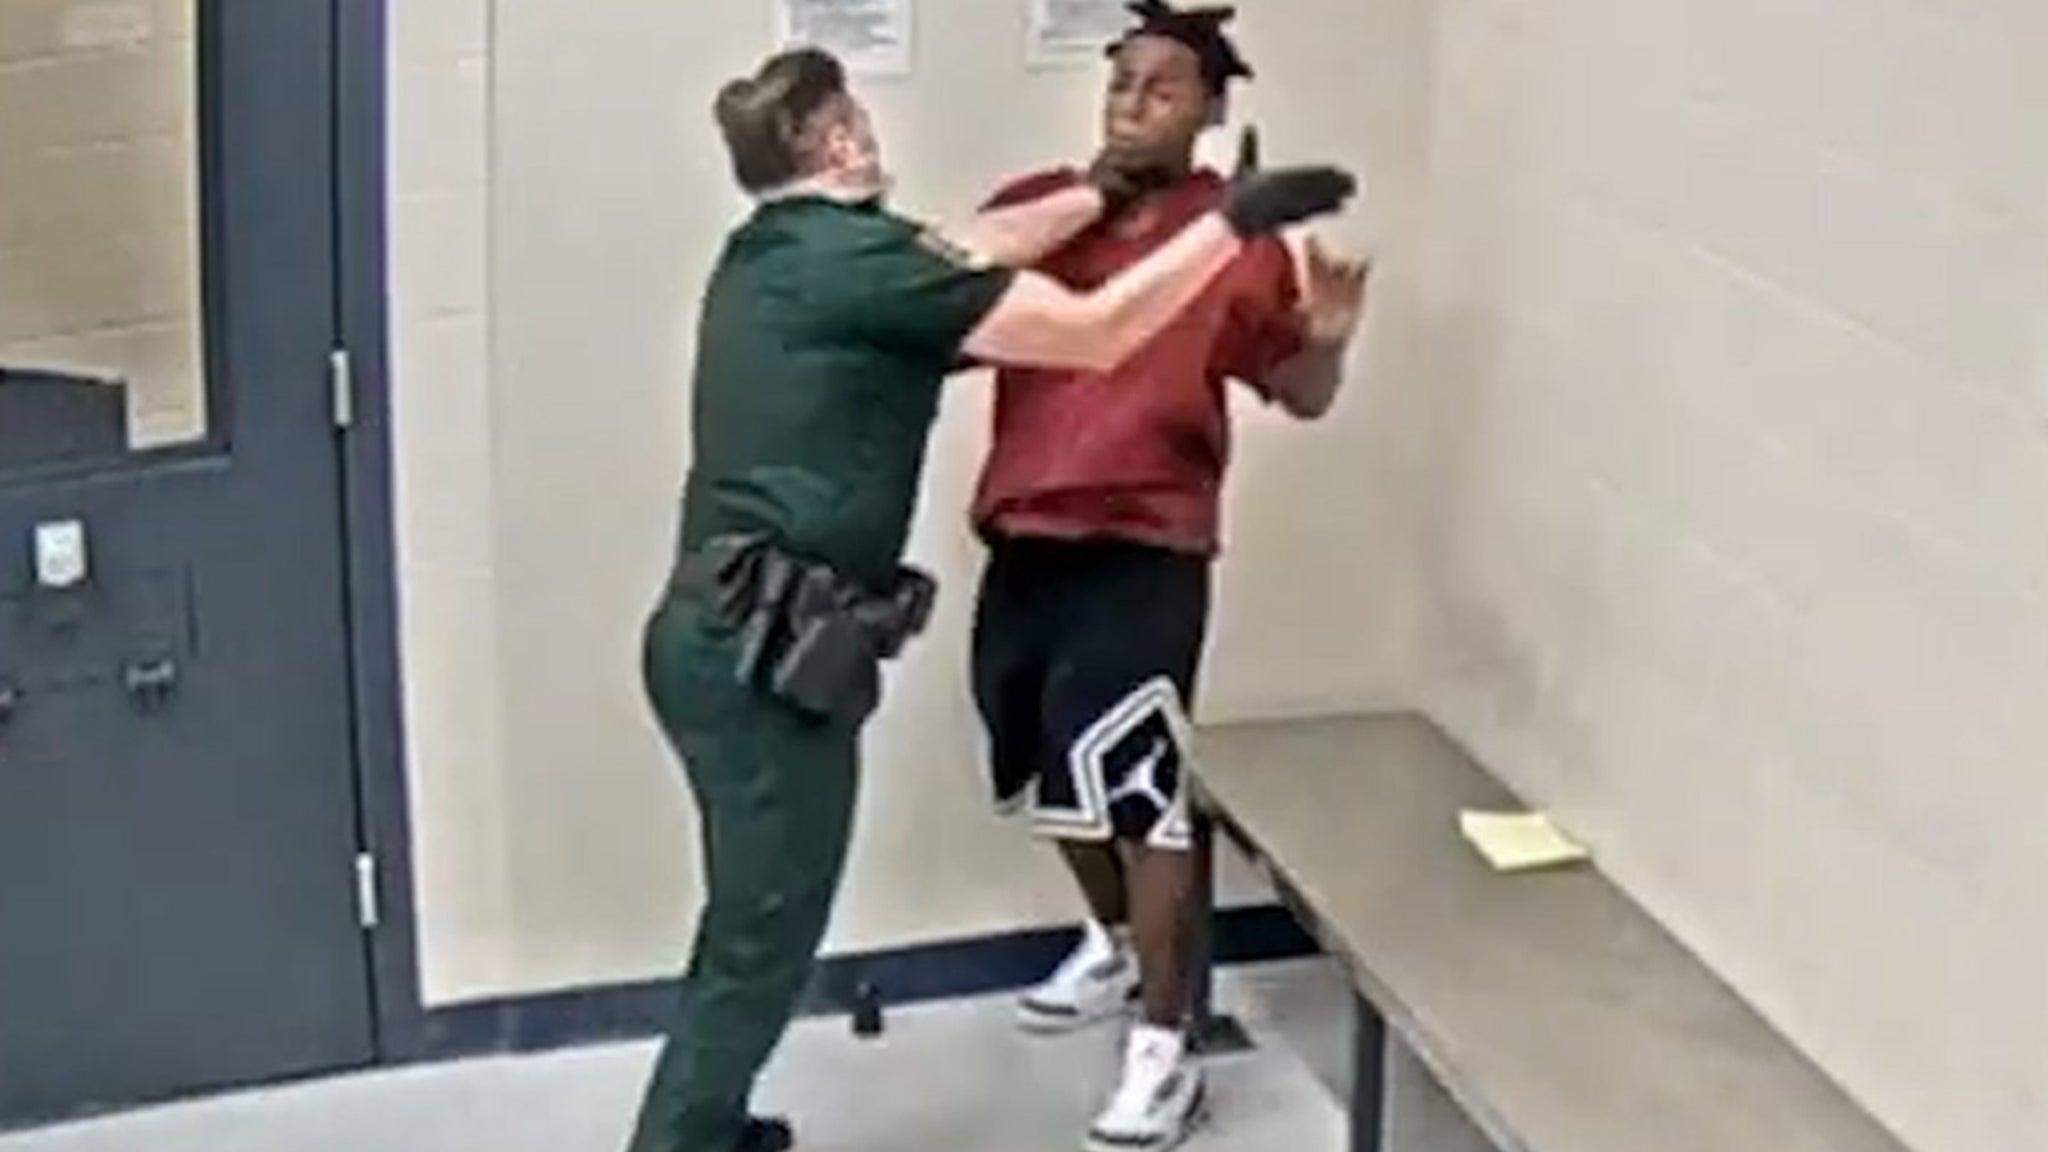 Black Lives Matter Teen Choked, Struck by Deputy ... Investigation Underway